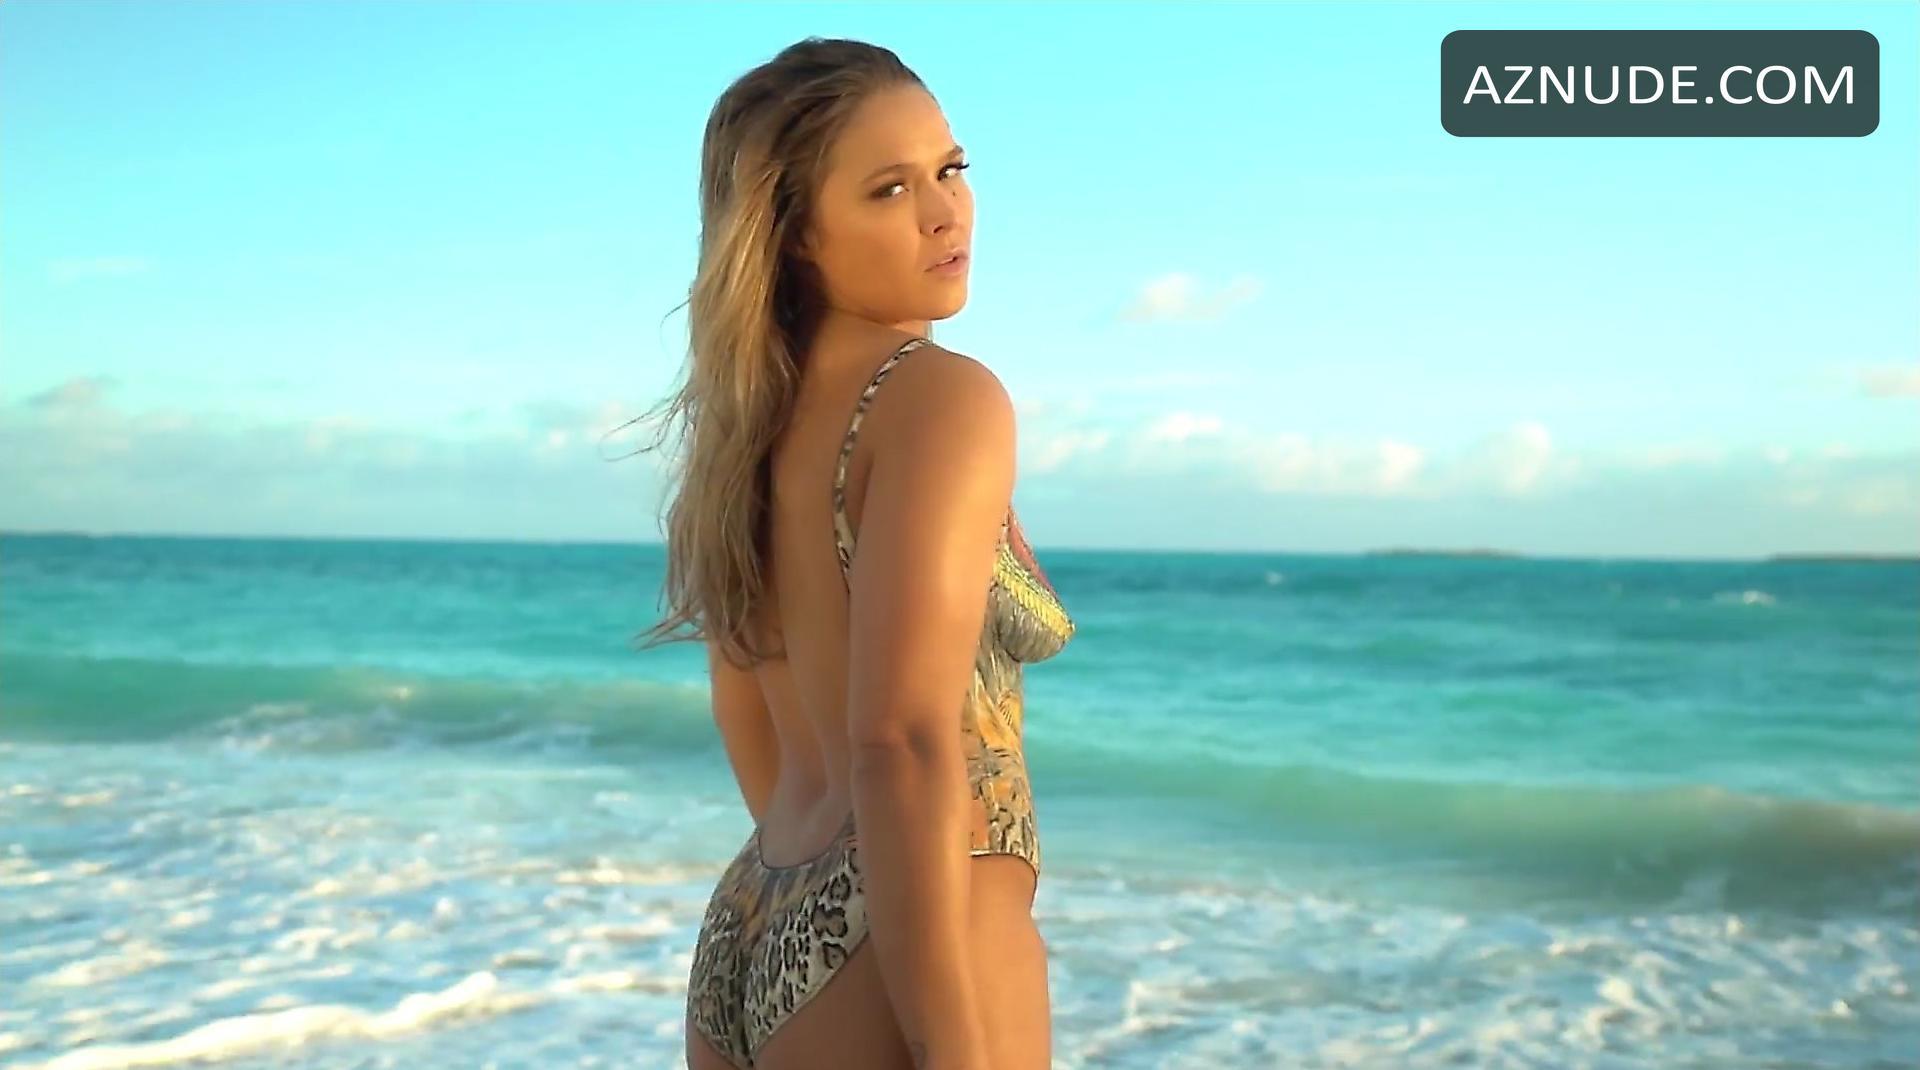 Sveta bilyalova nude leaked sex tape topless pics